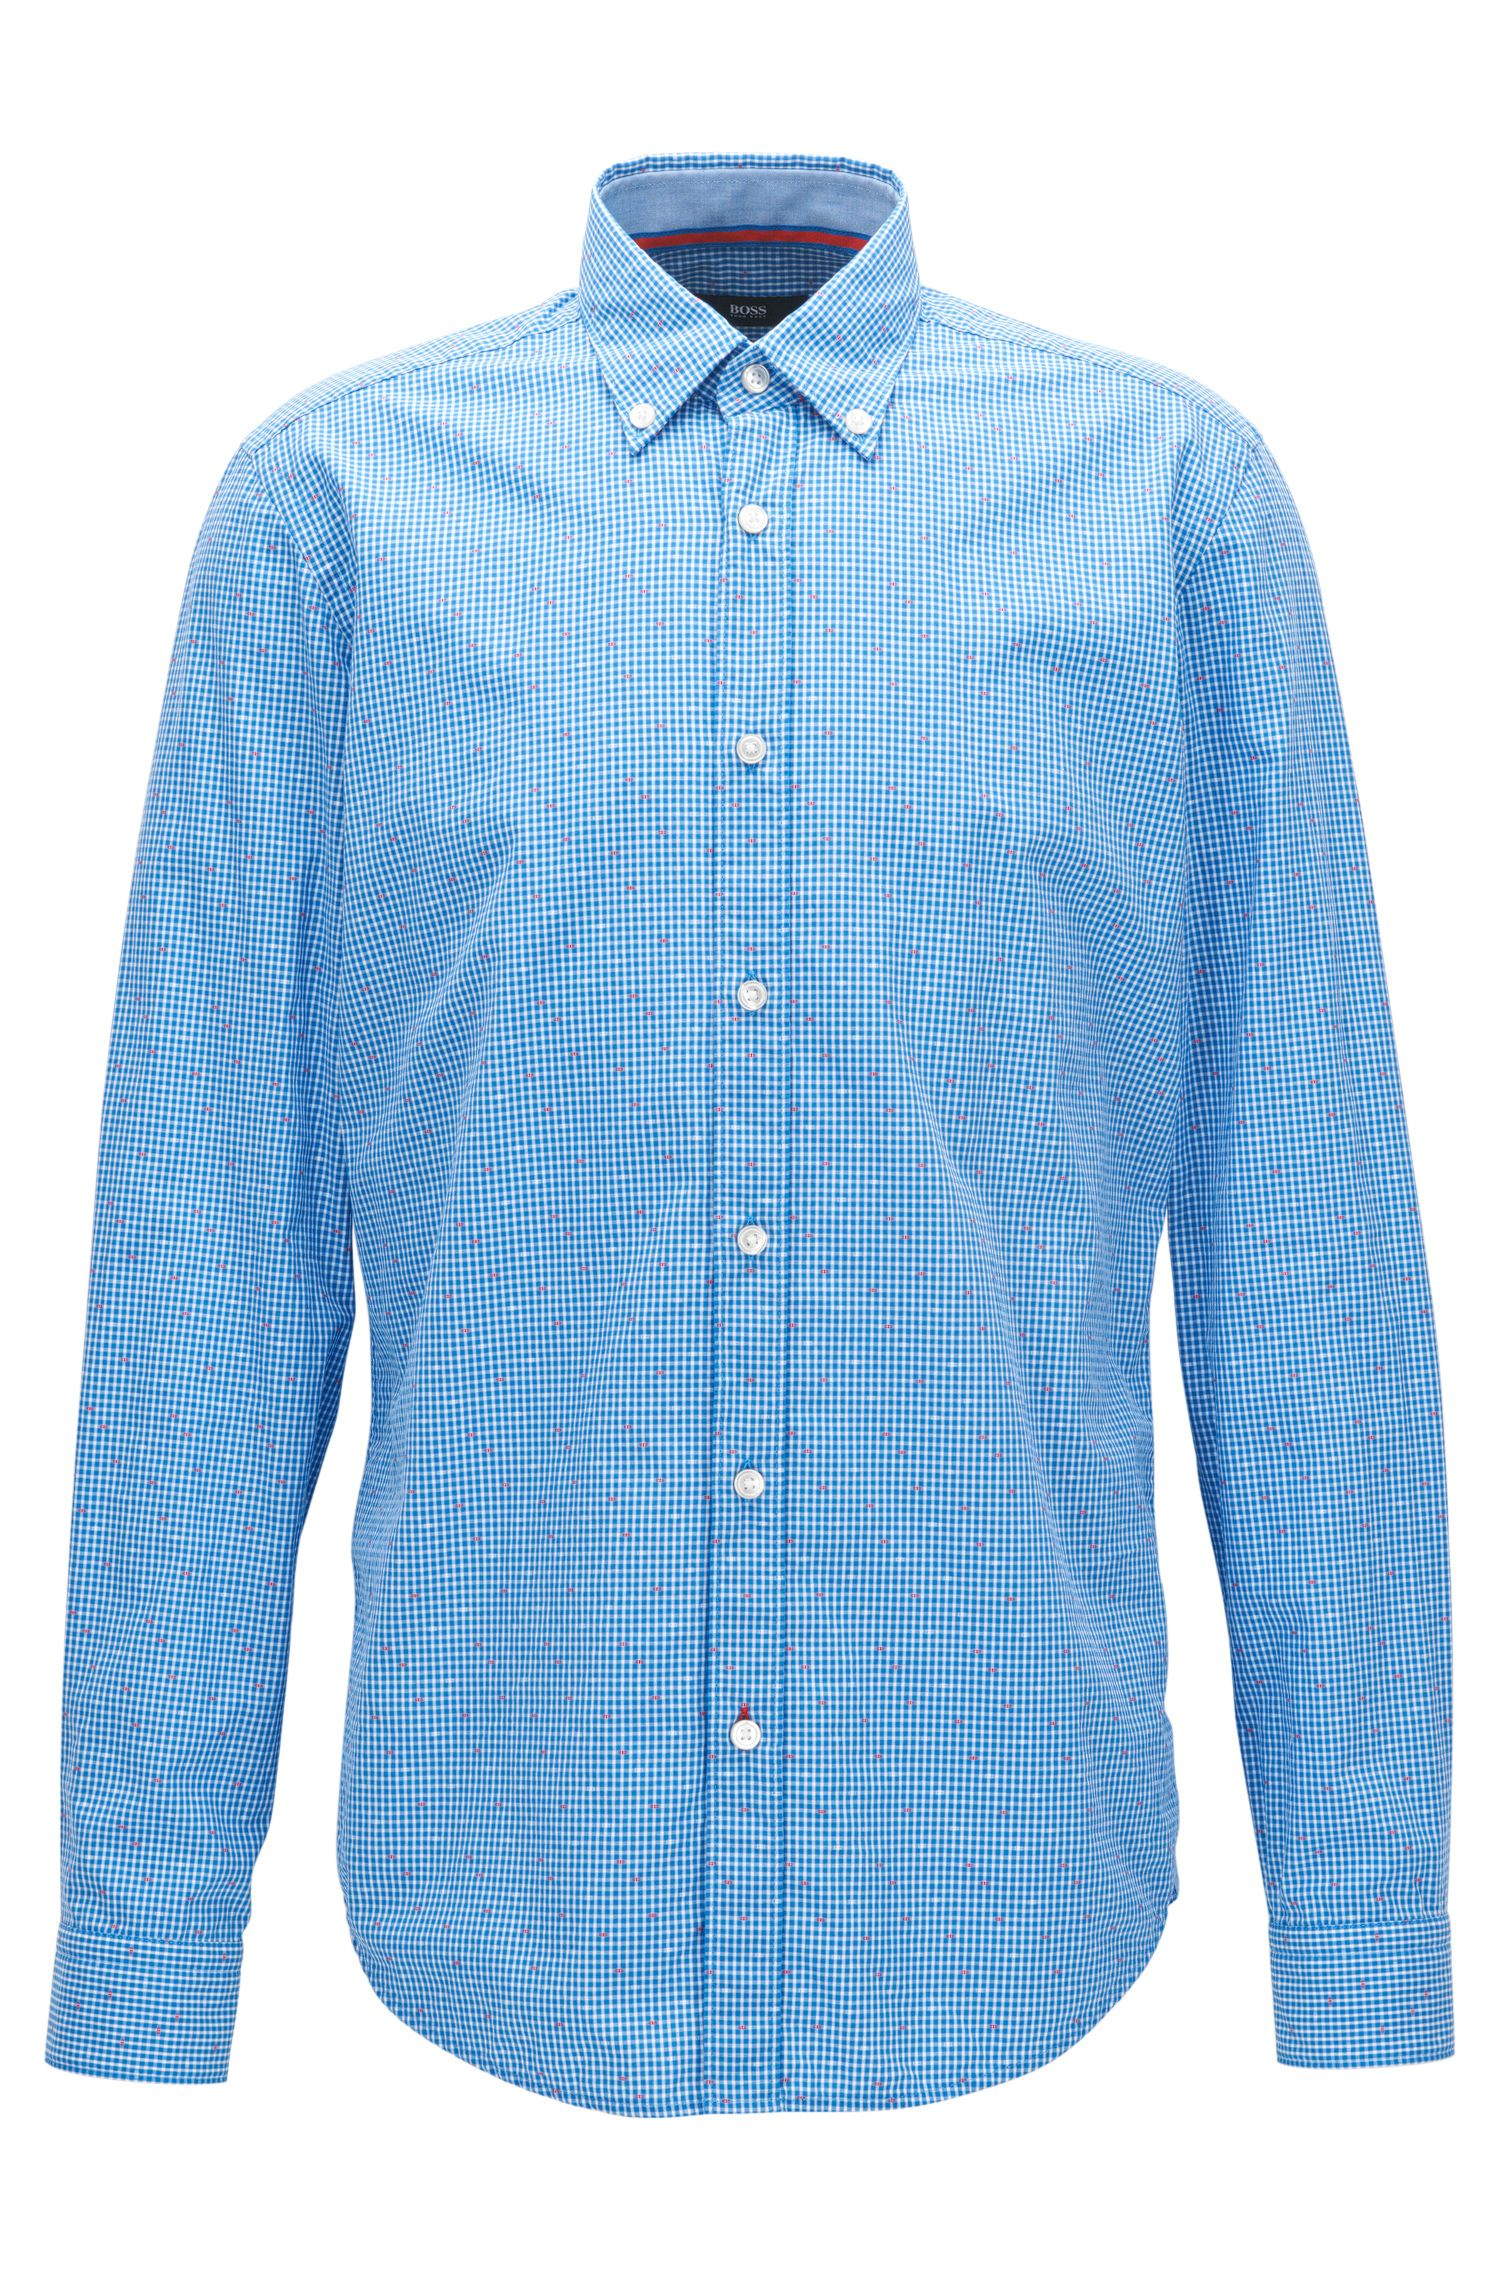 Patterned Cotton Sport Shirt, Regular Fit | Lod